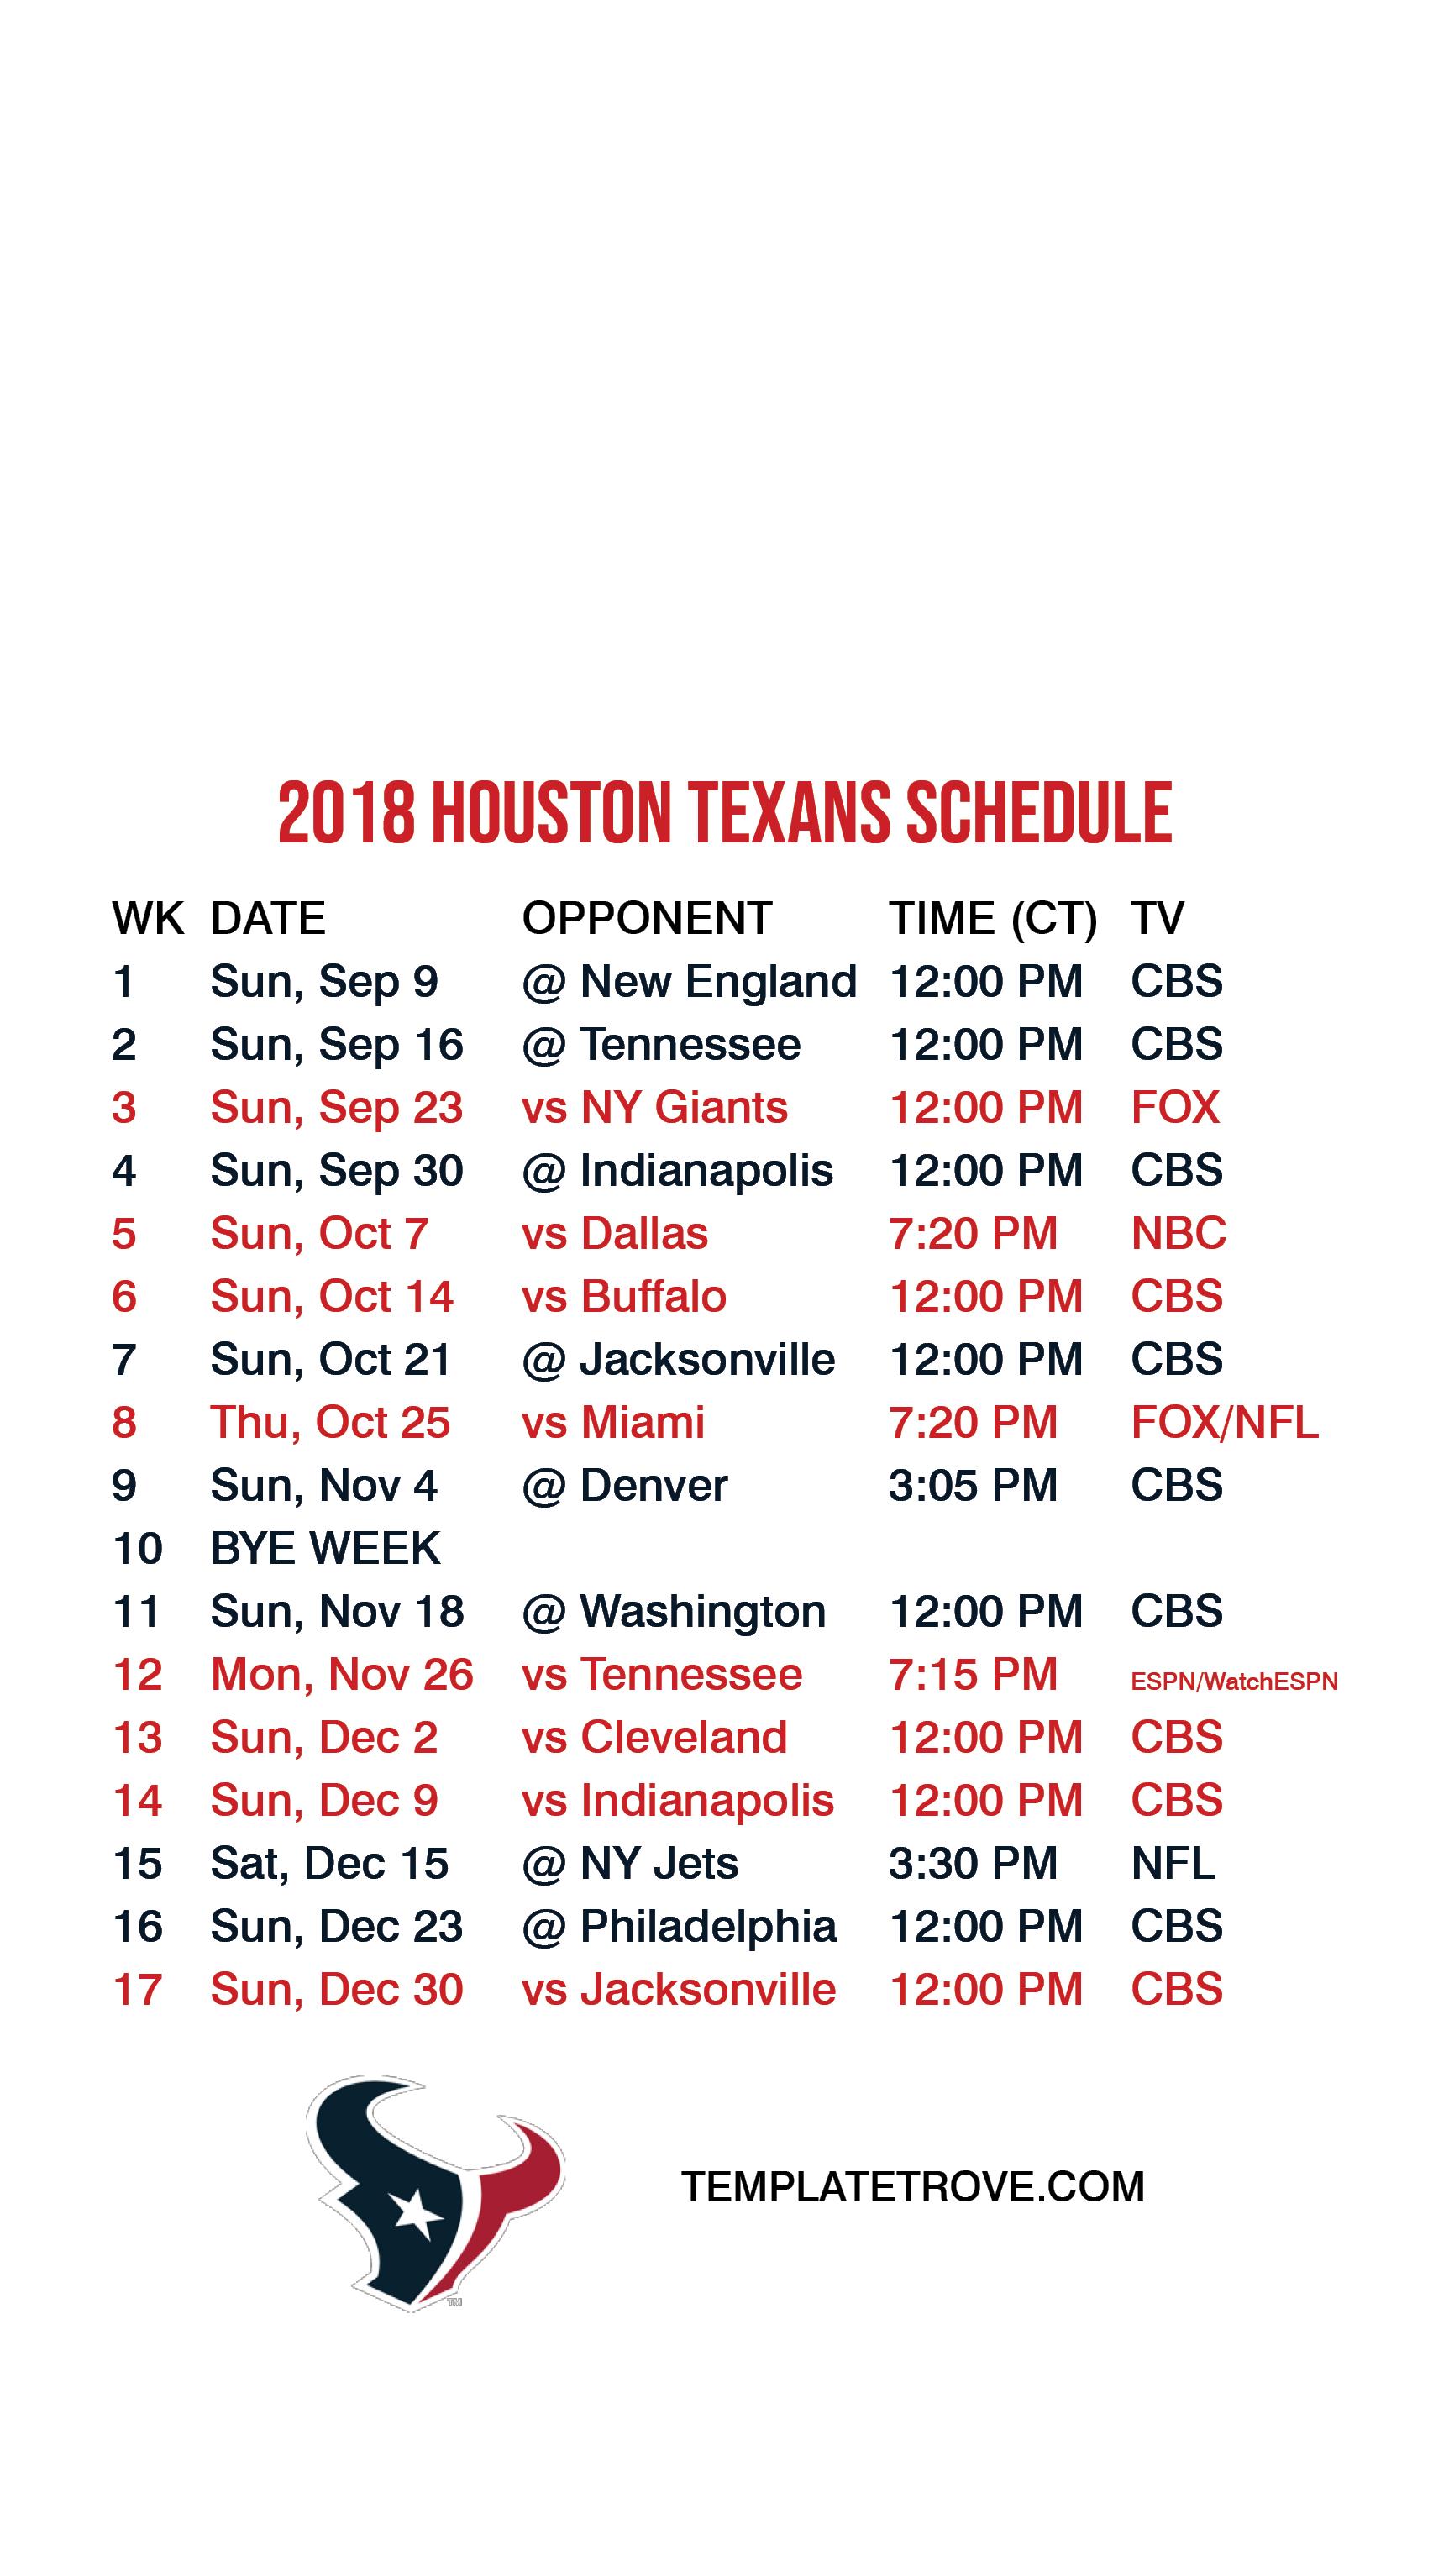 2018 2019 Houston Texans Lock Screen Schedule For Iphone 6 7